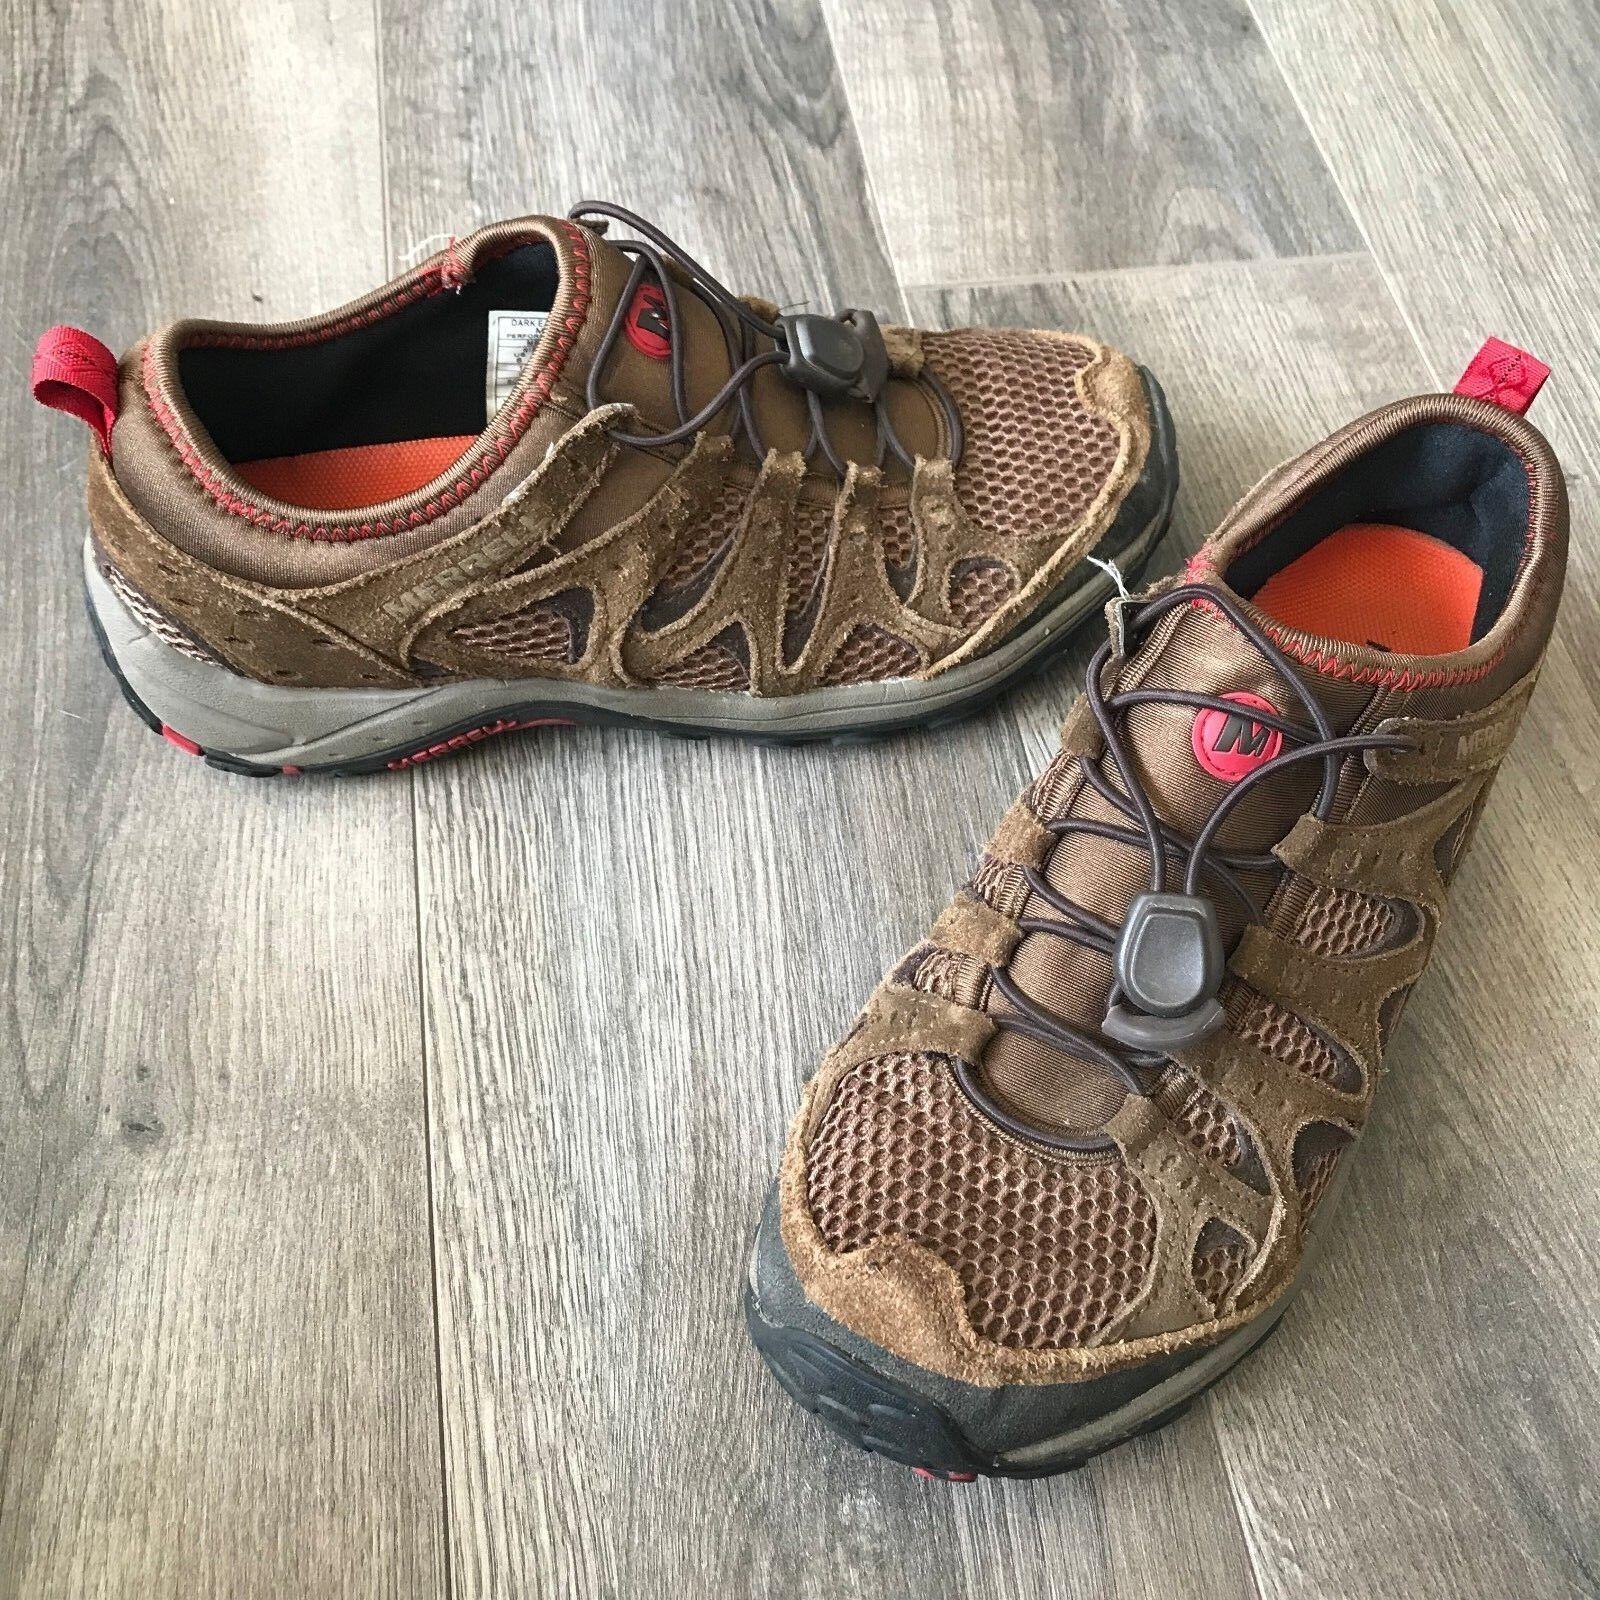 Merrell Men's Mimic Stretch Dark Earth/Crimson Hiking Shoes Size 8